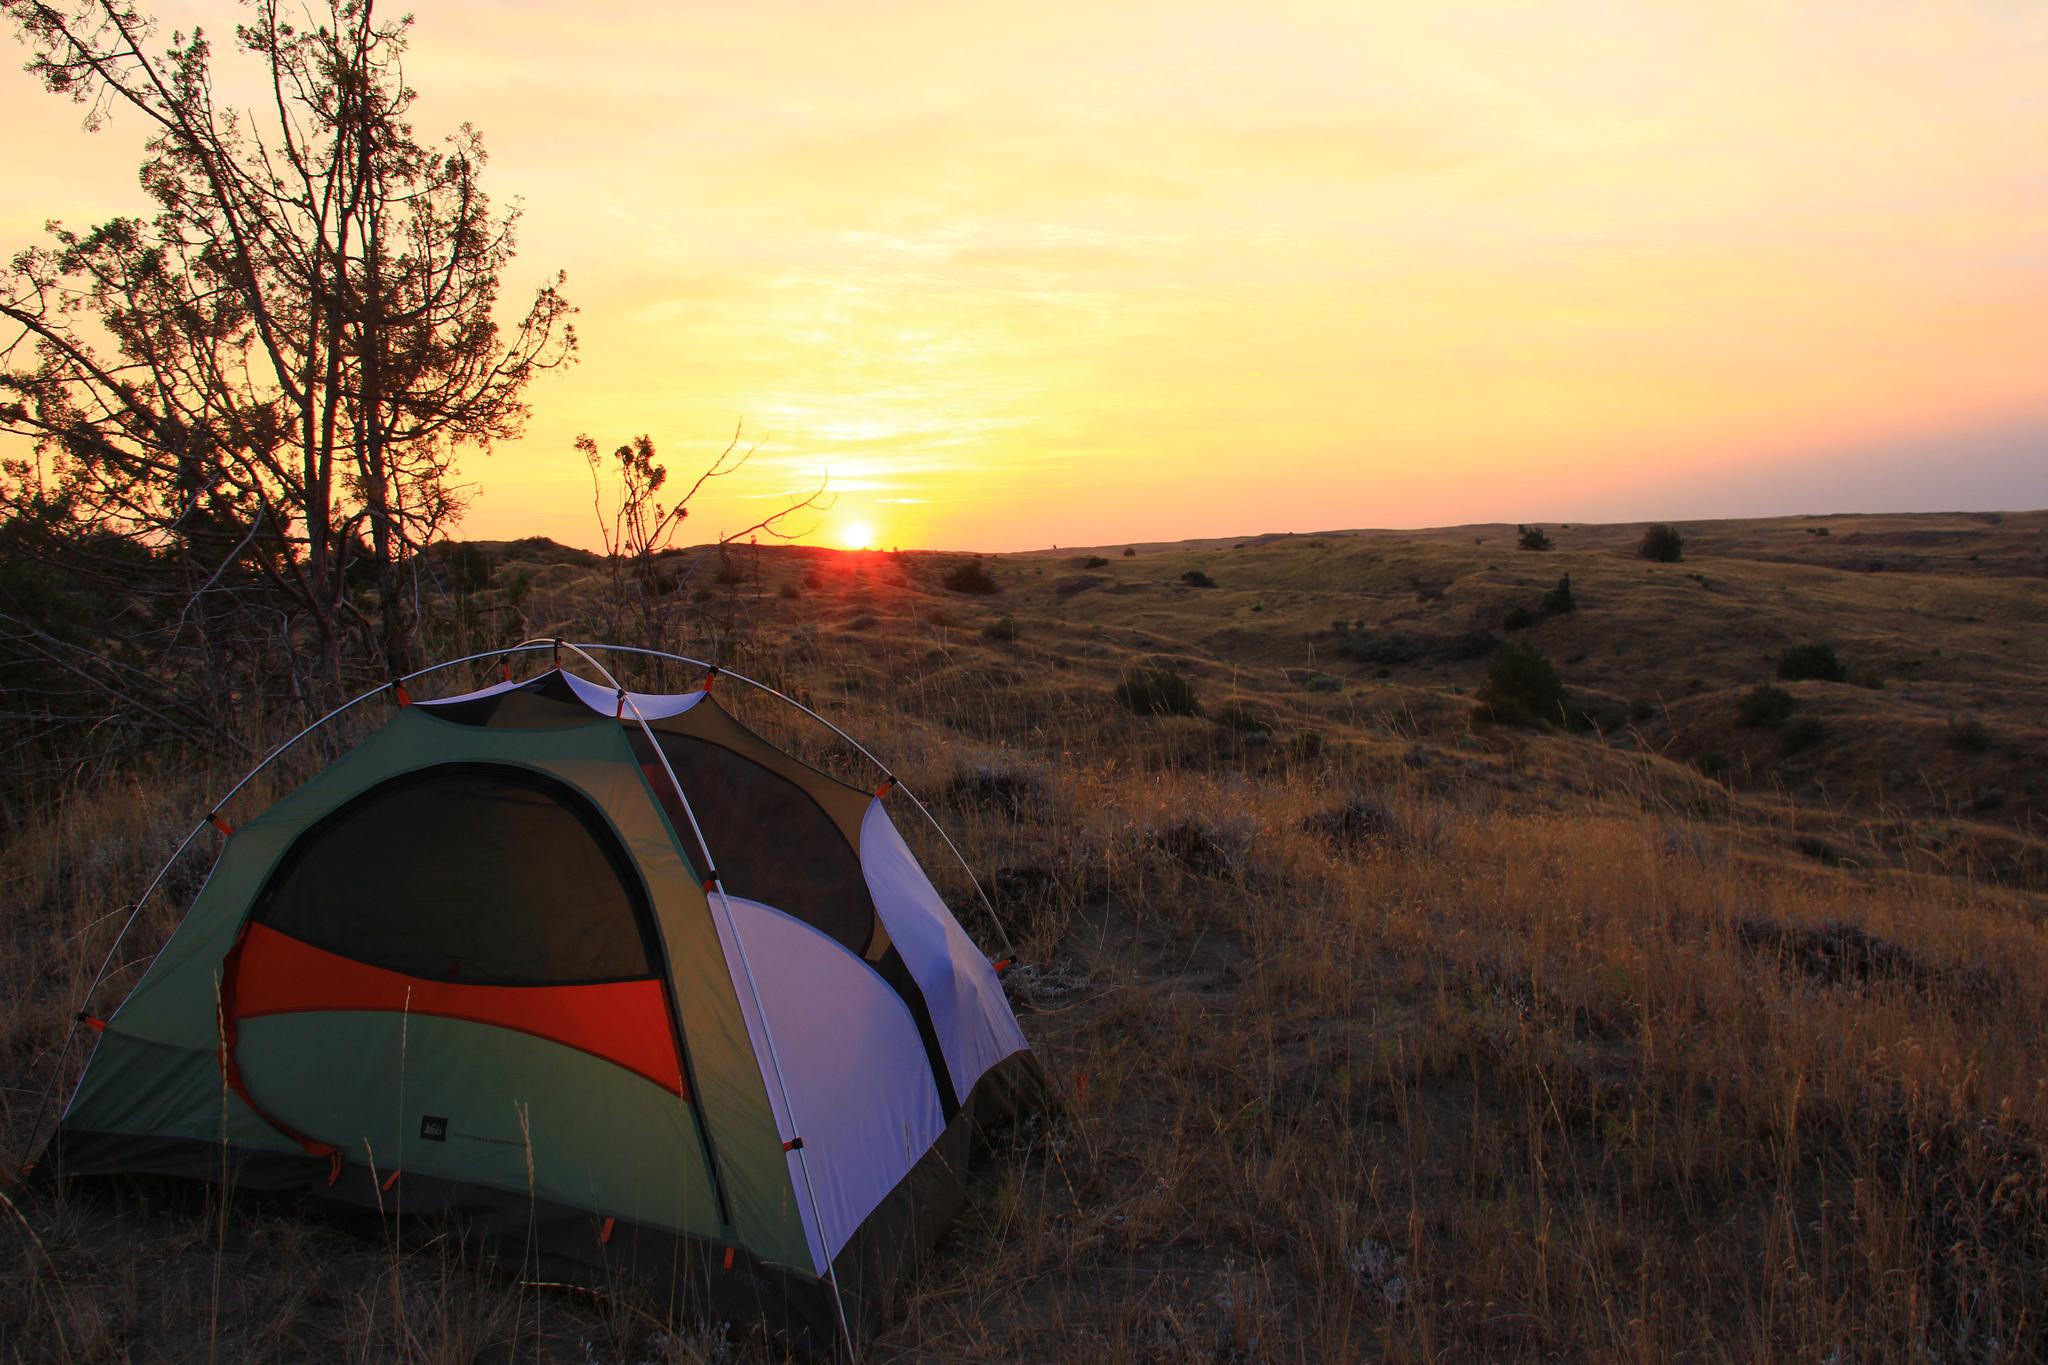 Photo Credit: Bureau of Land Management Oregon